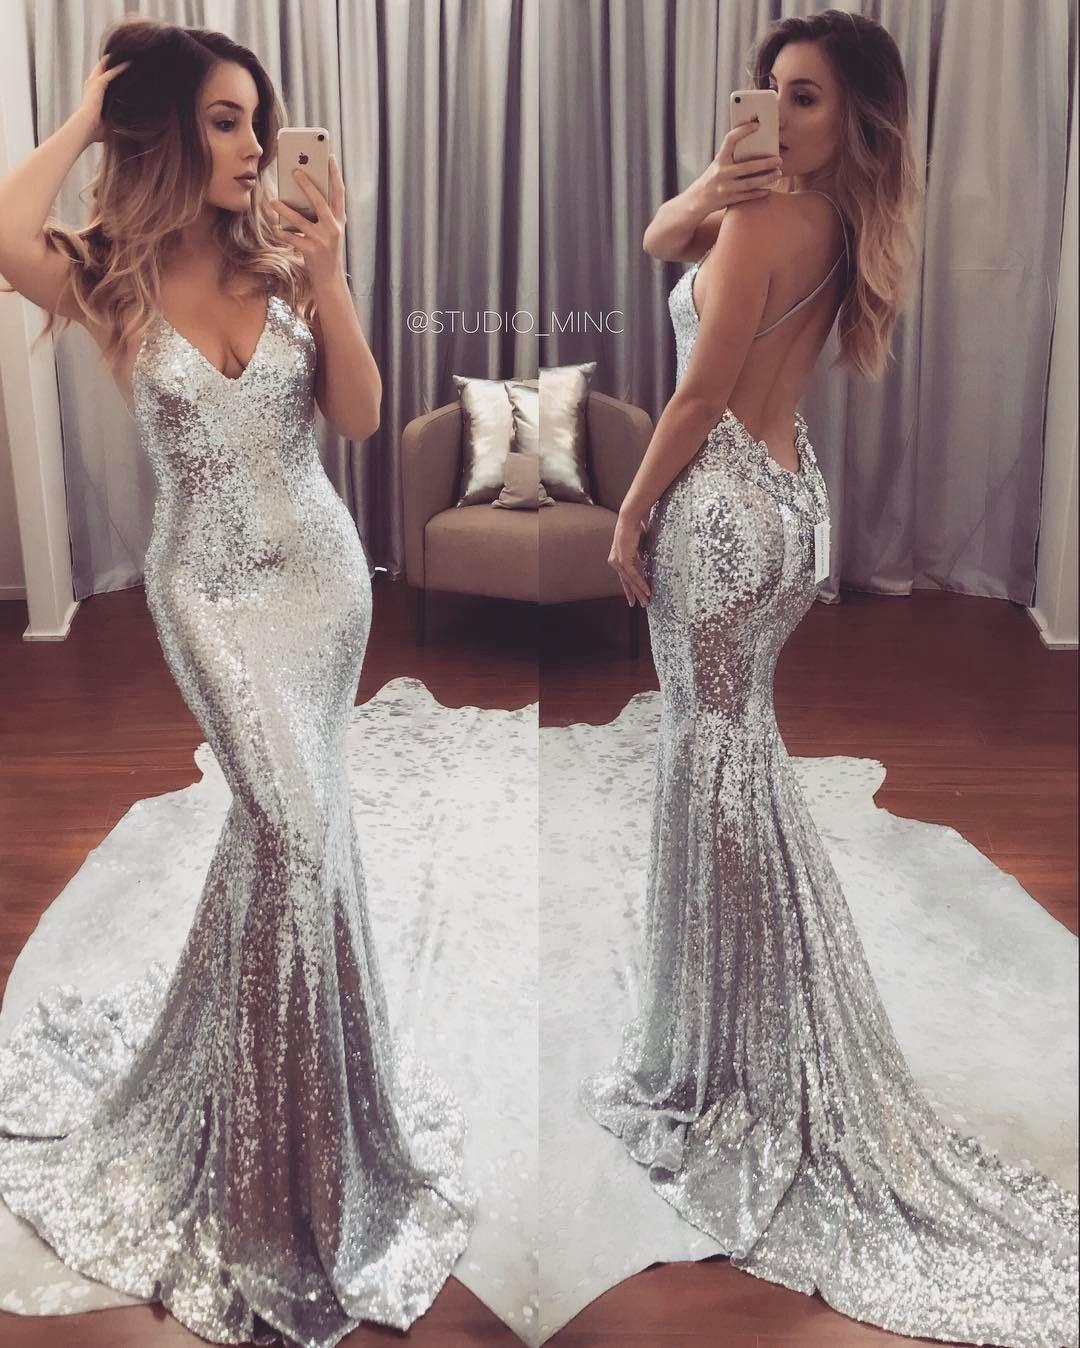 Silver angel backless formal prom dress by studio minc prom